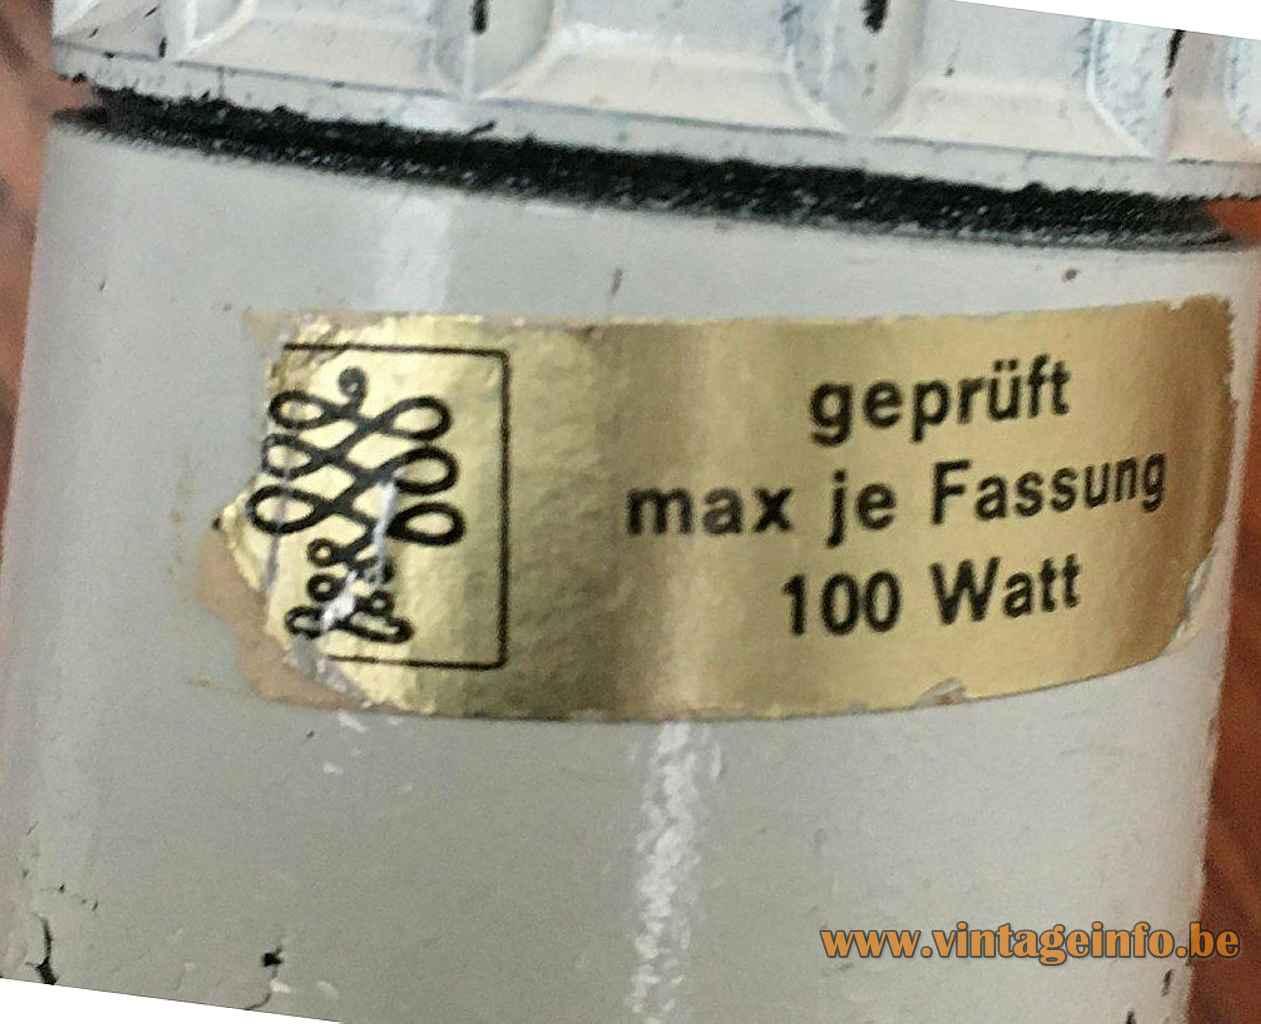 Goldkant Leuchten Orsa pendant lamp gold paper label cocoon plastic lampshade 1970s Germany E27 socket